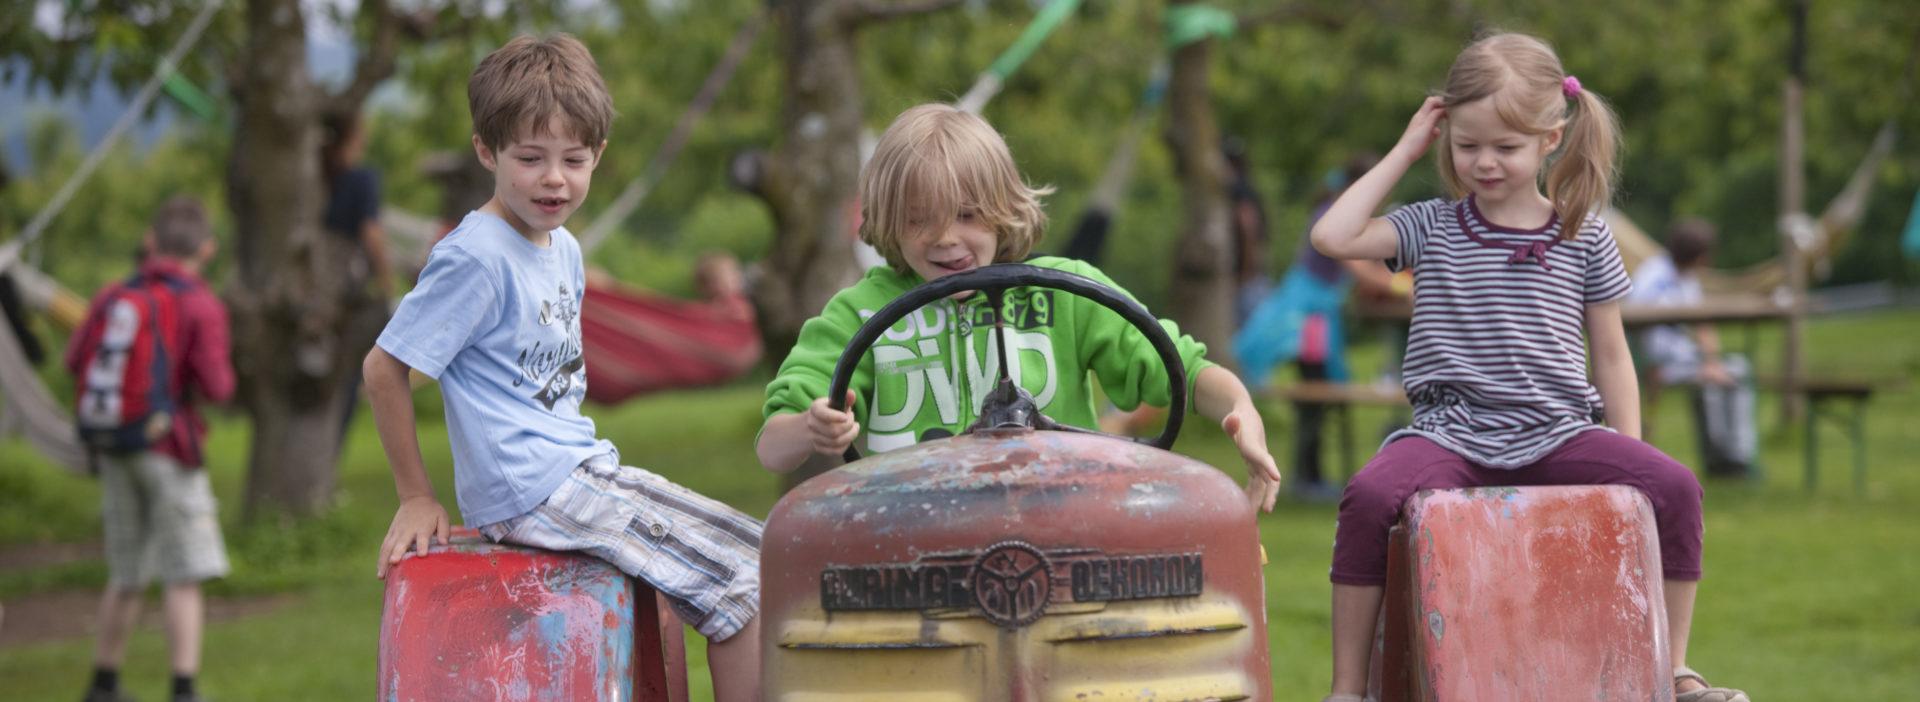 Juckerhof Traktor Kinder